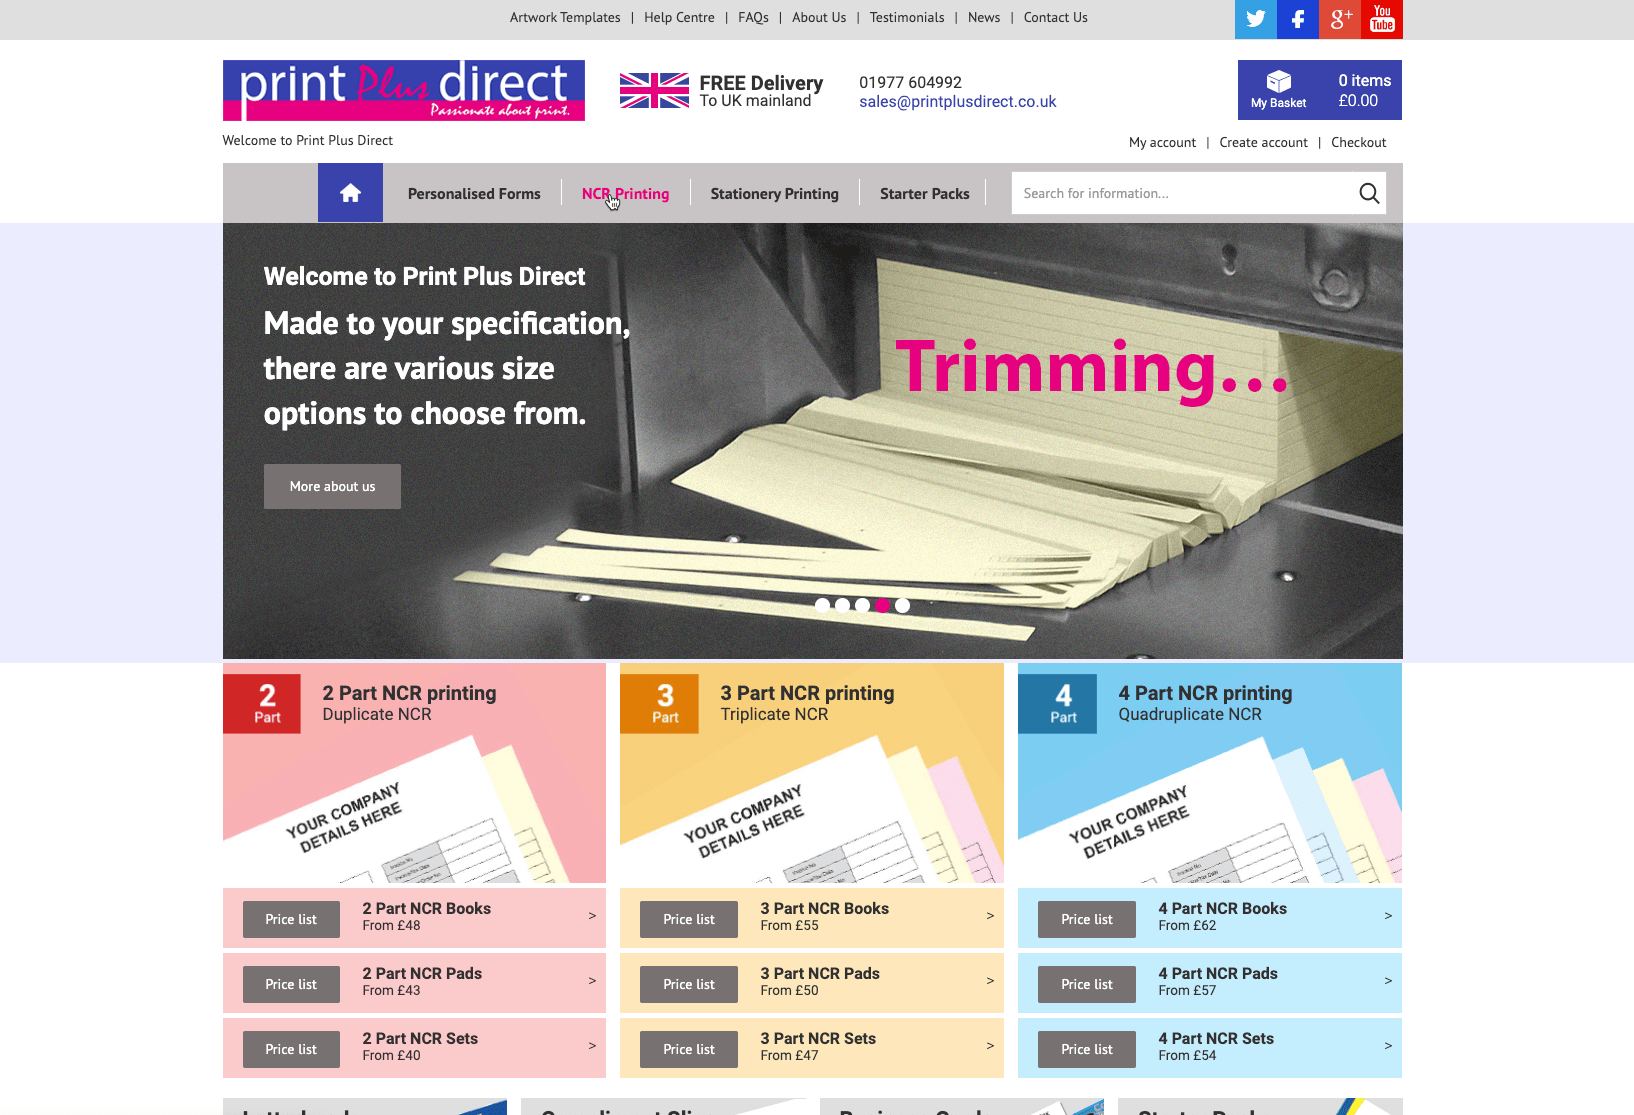 Screenshot of the Print Plus Direct website